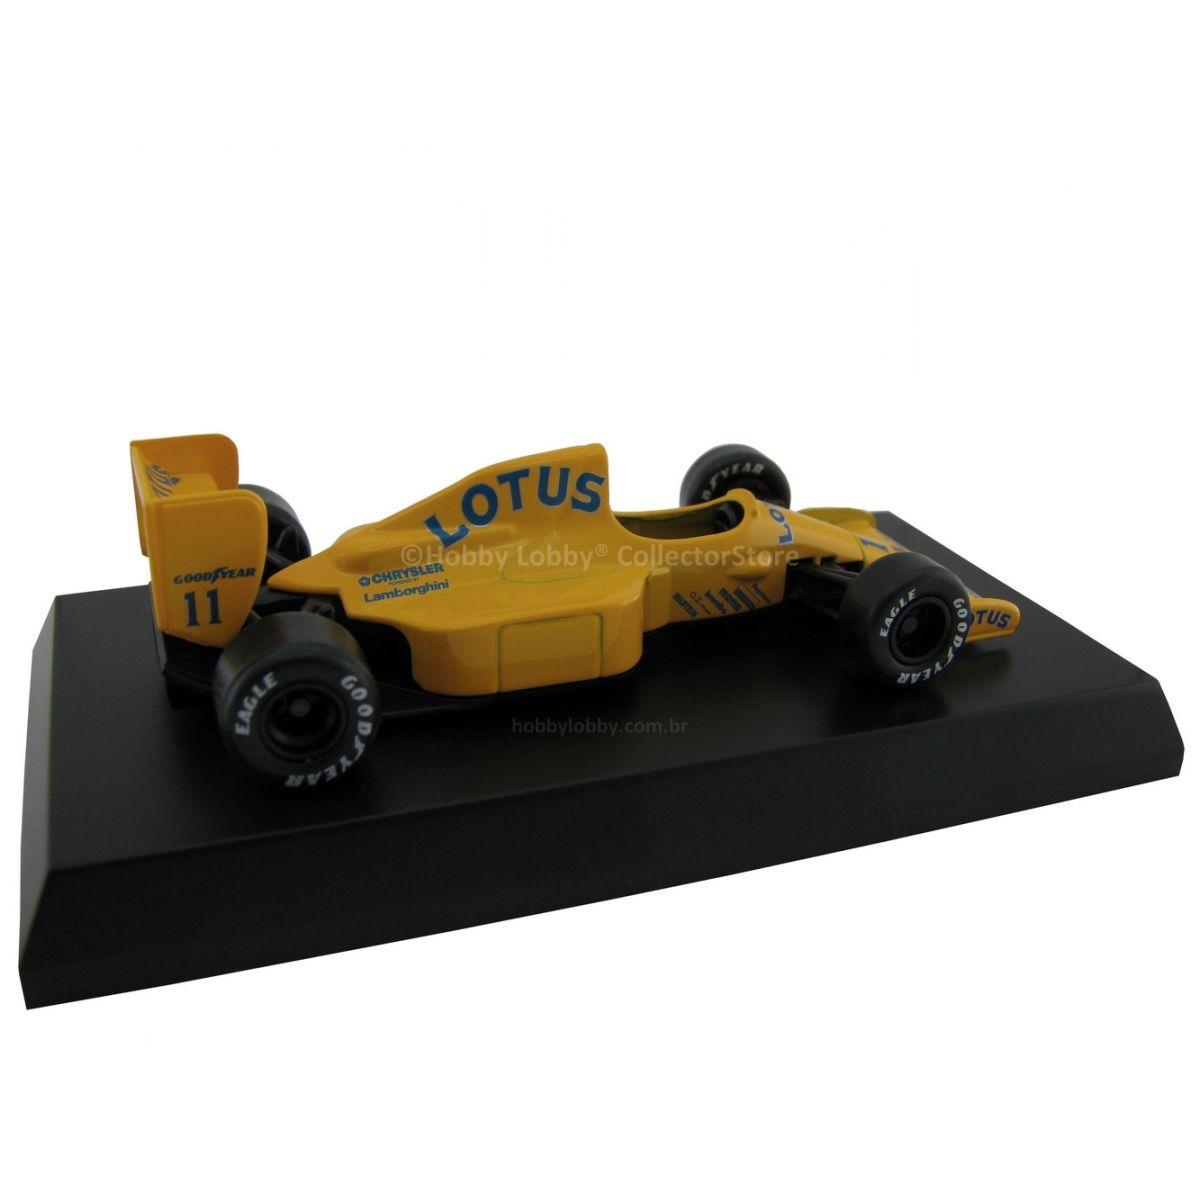 Kyosho - Classic Team Lotus - Lotus 102  - Hobby Lobby CollectorStore